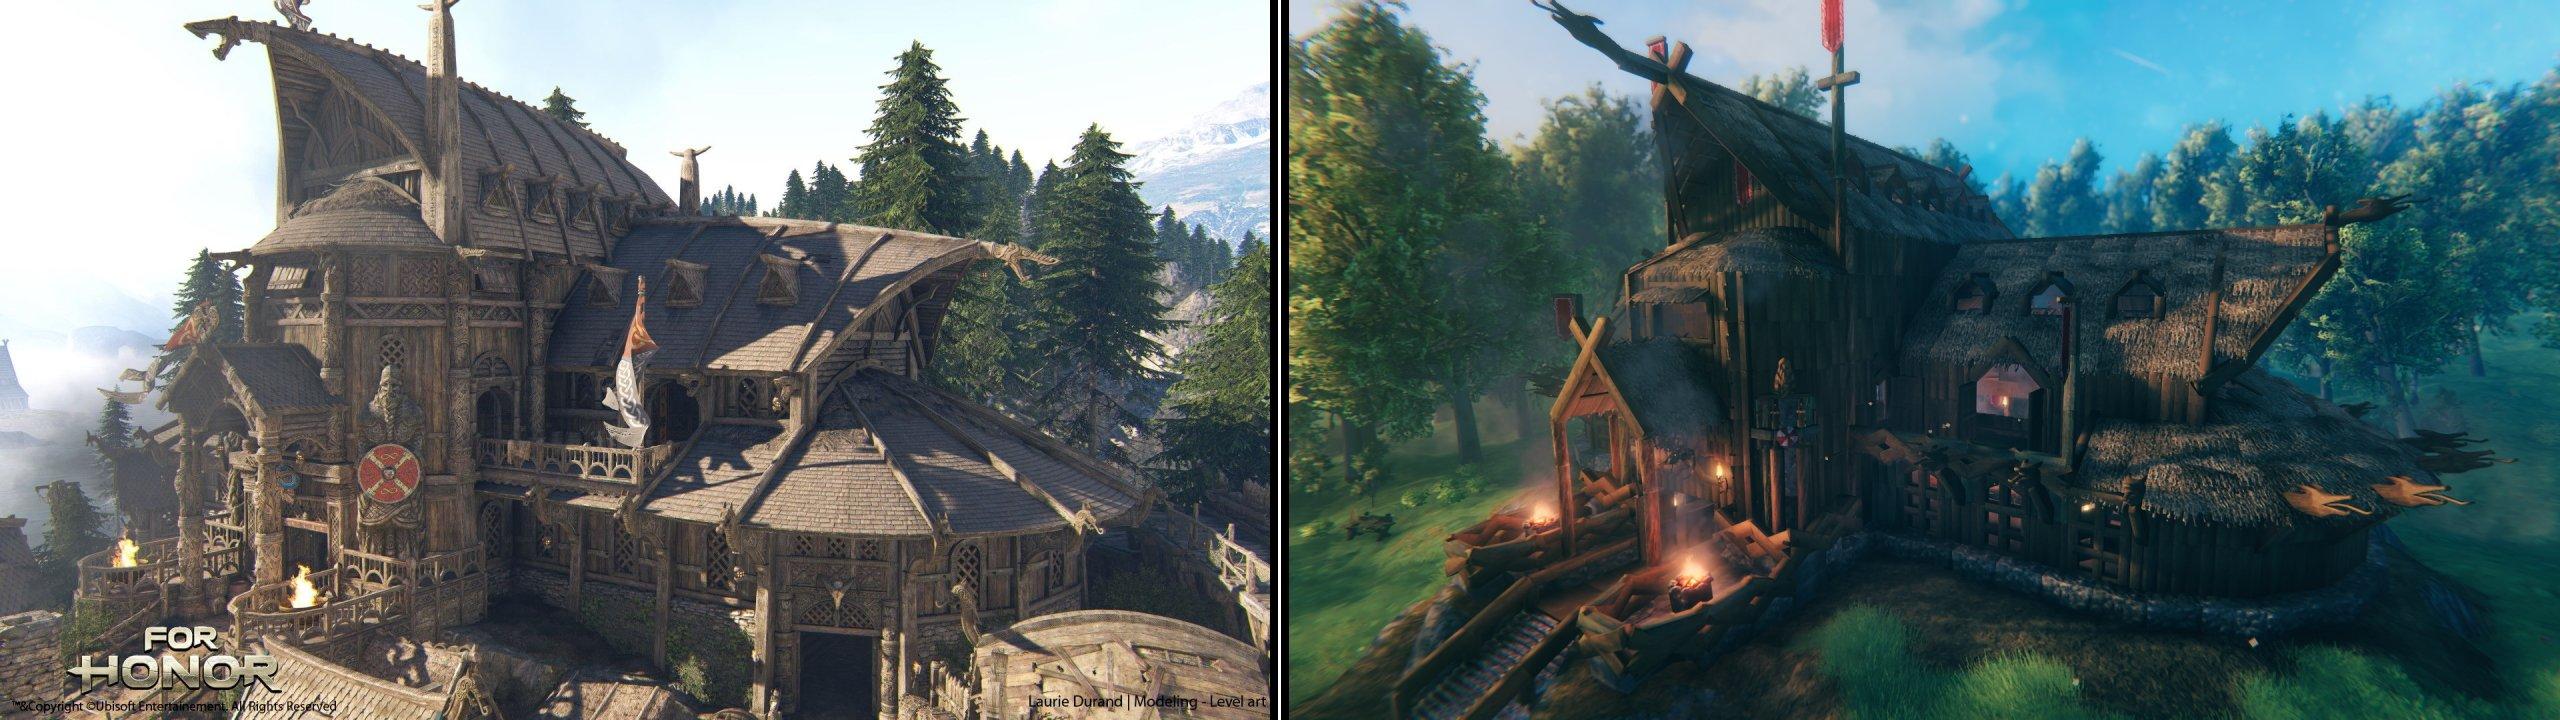 Valheim best creations impressive for honor loghouse